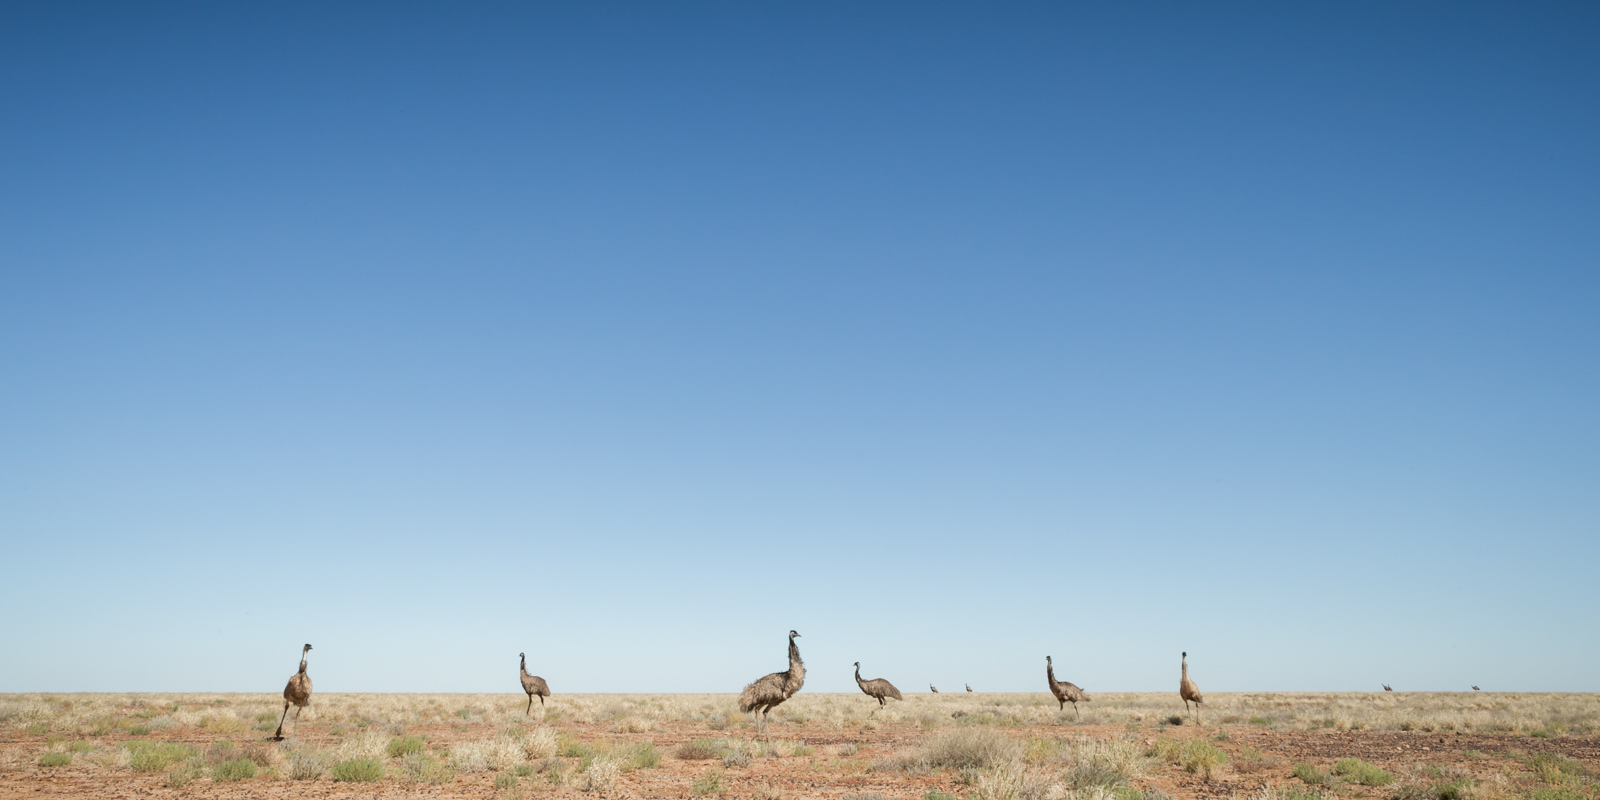 Emuscape_David Stowe-1544-2.jpg